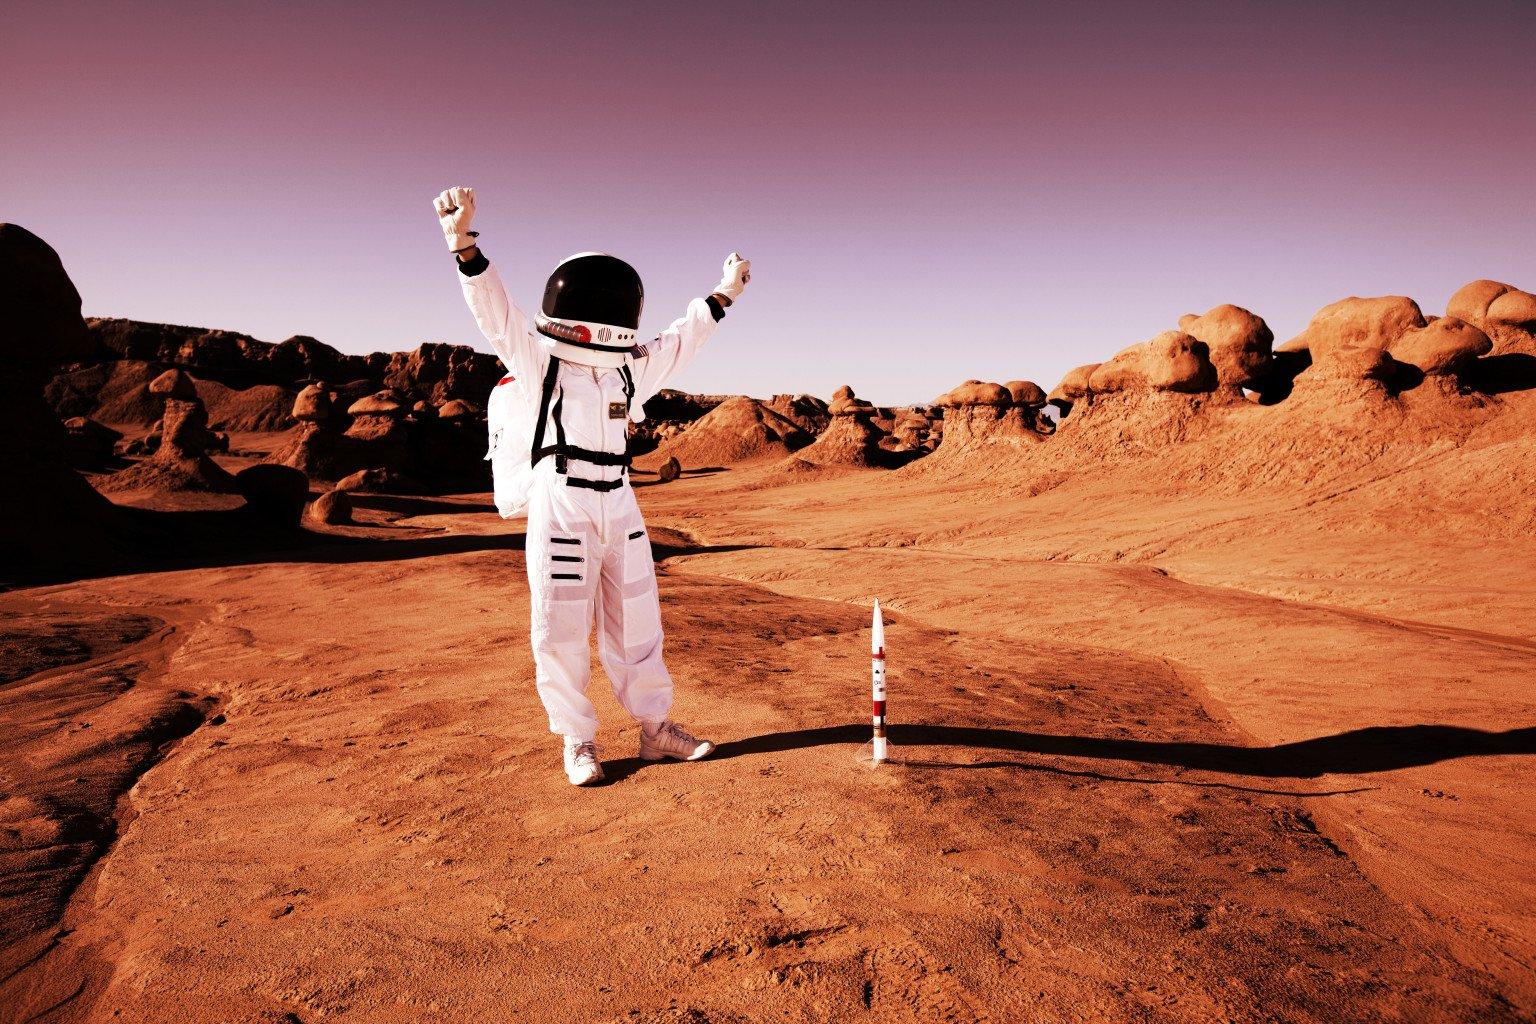 космонавтика 12 апреля день космонавтики астронавты отвратительные мужики